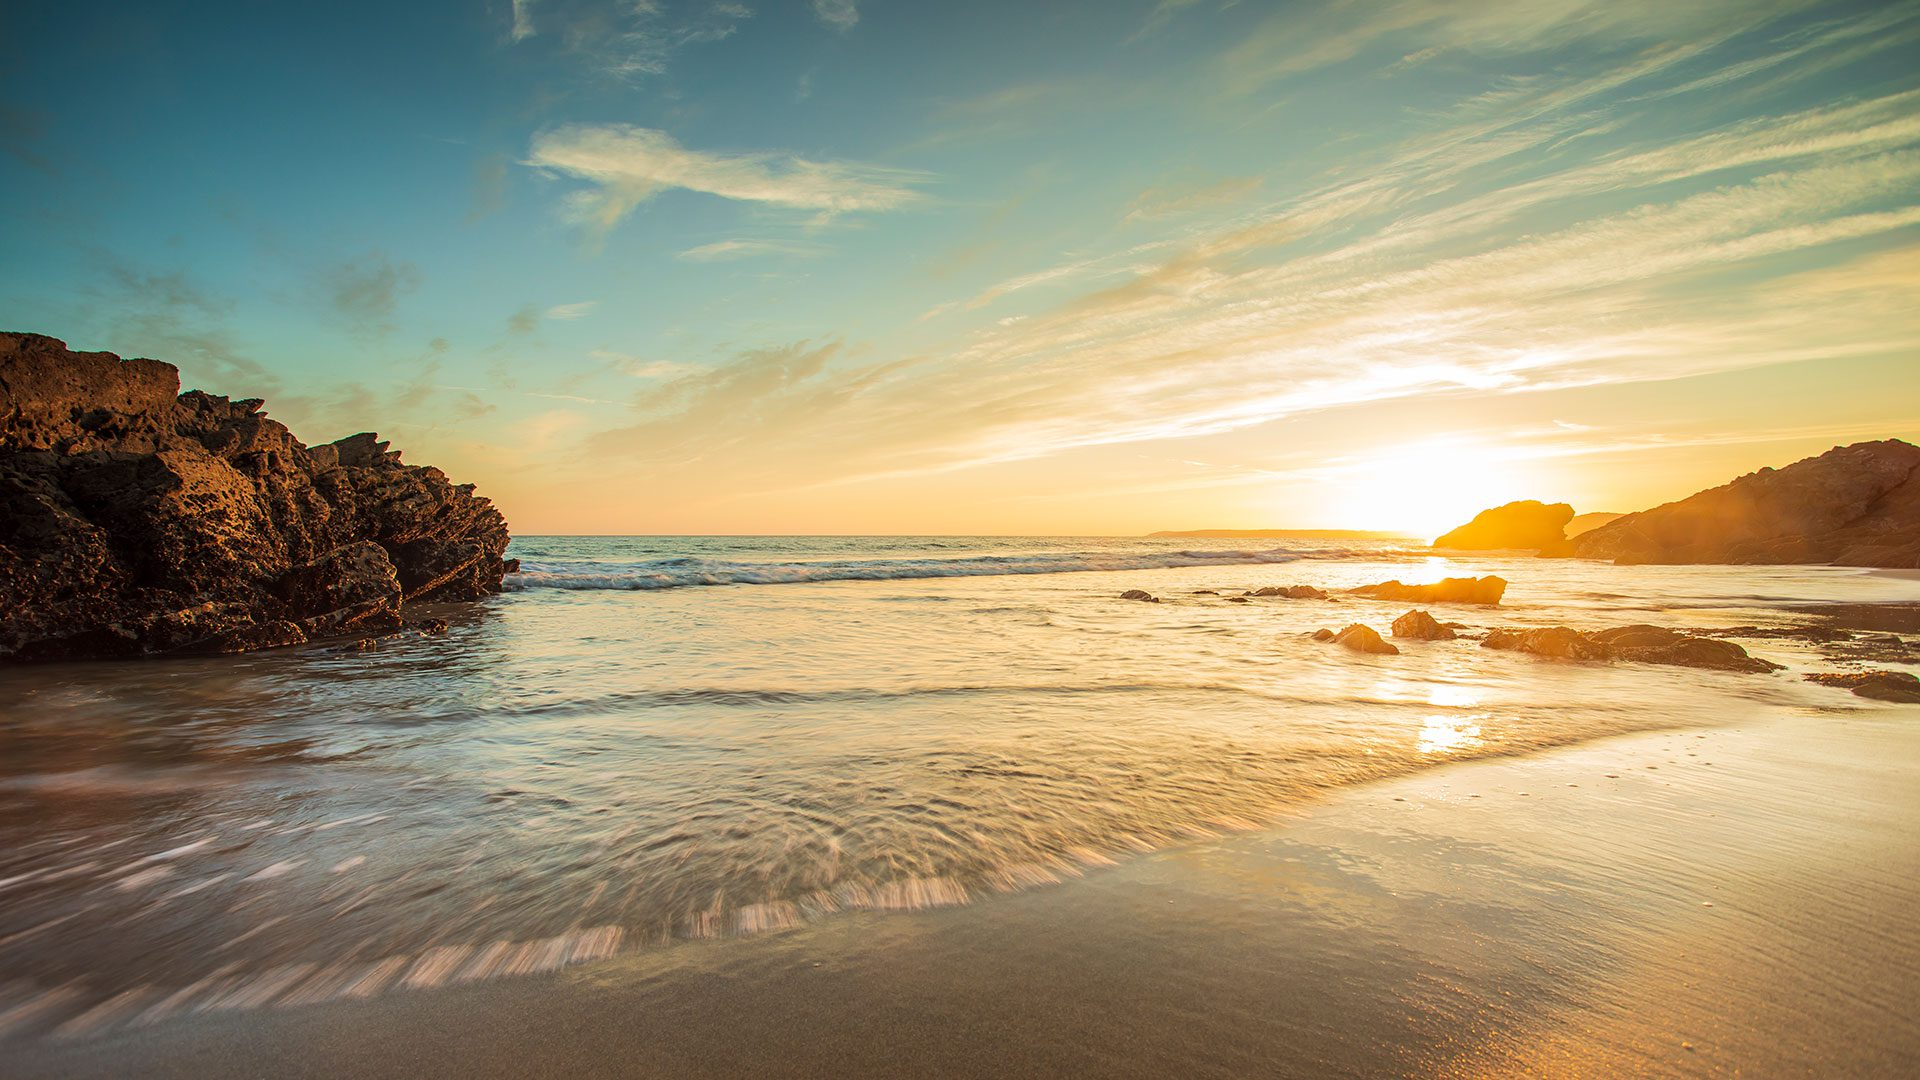 Whitsand Beach Cornwall